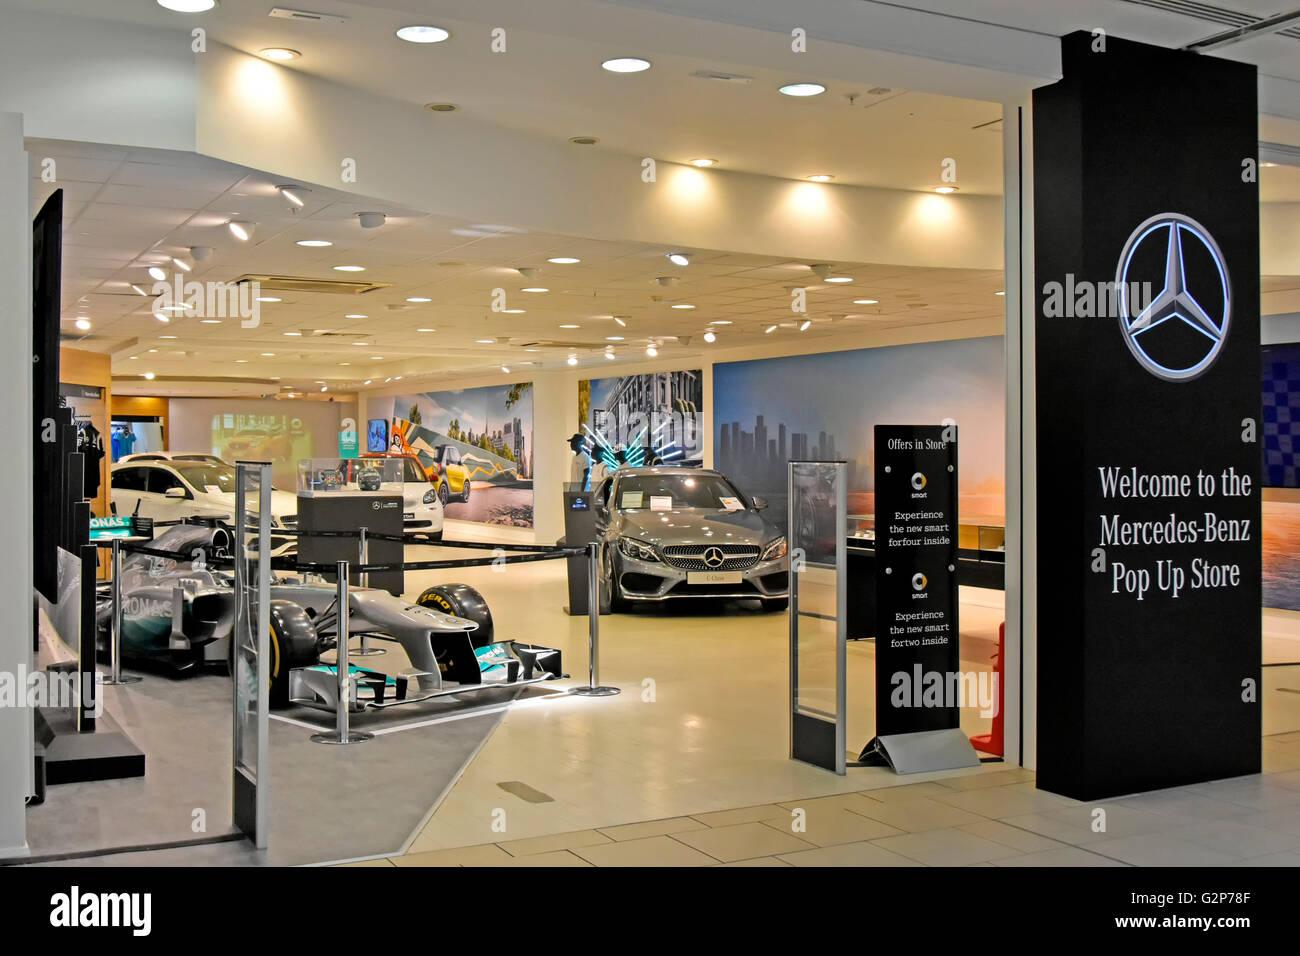 Pop up shop stockfotos pop up shop bilder alamy for Mercedes benz auto mall